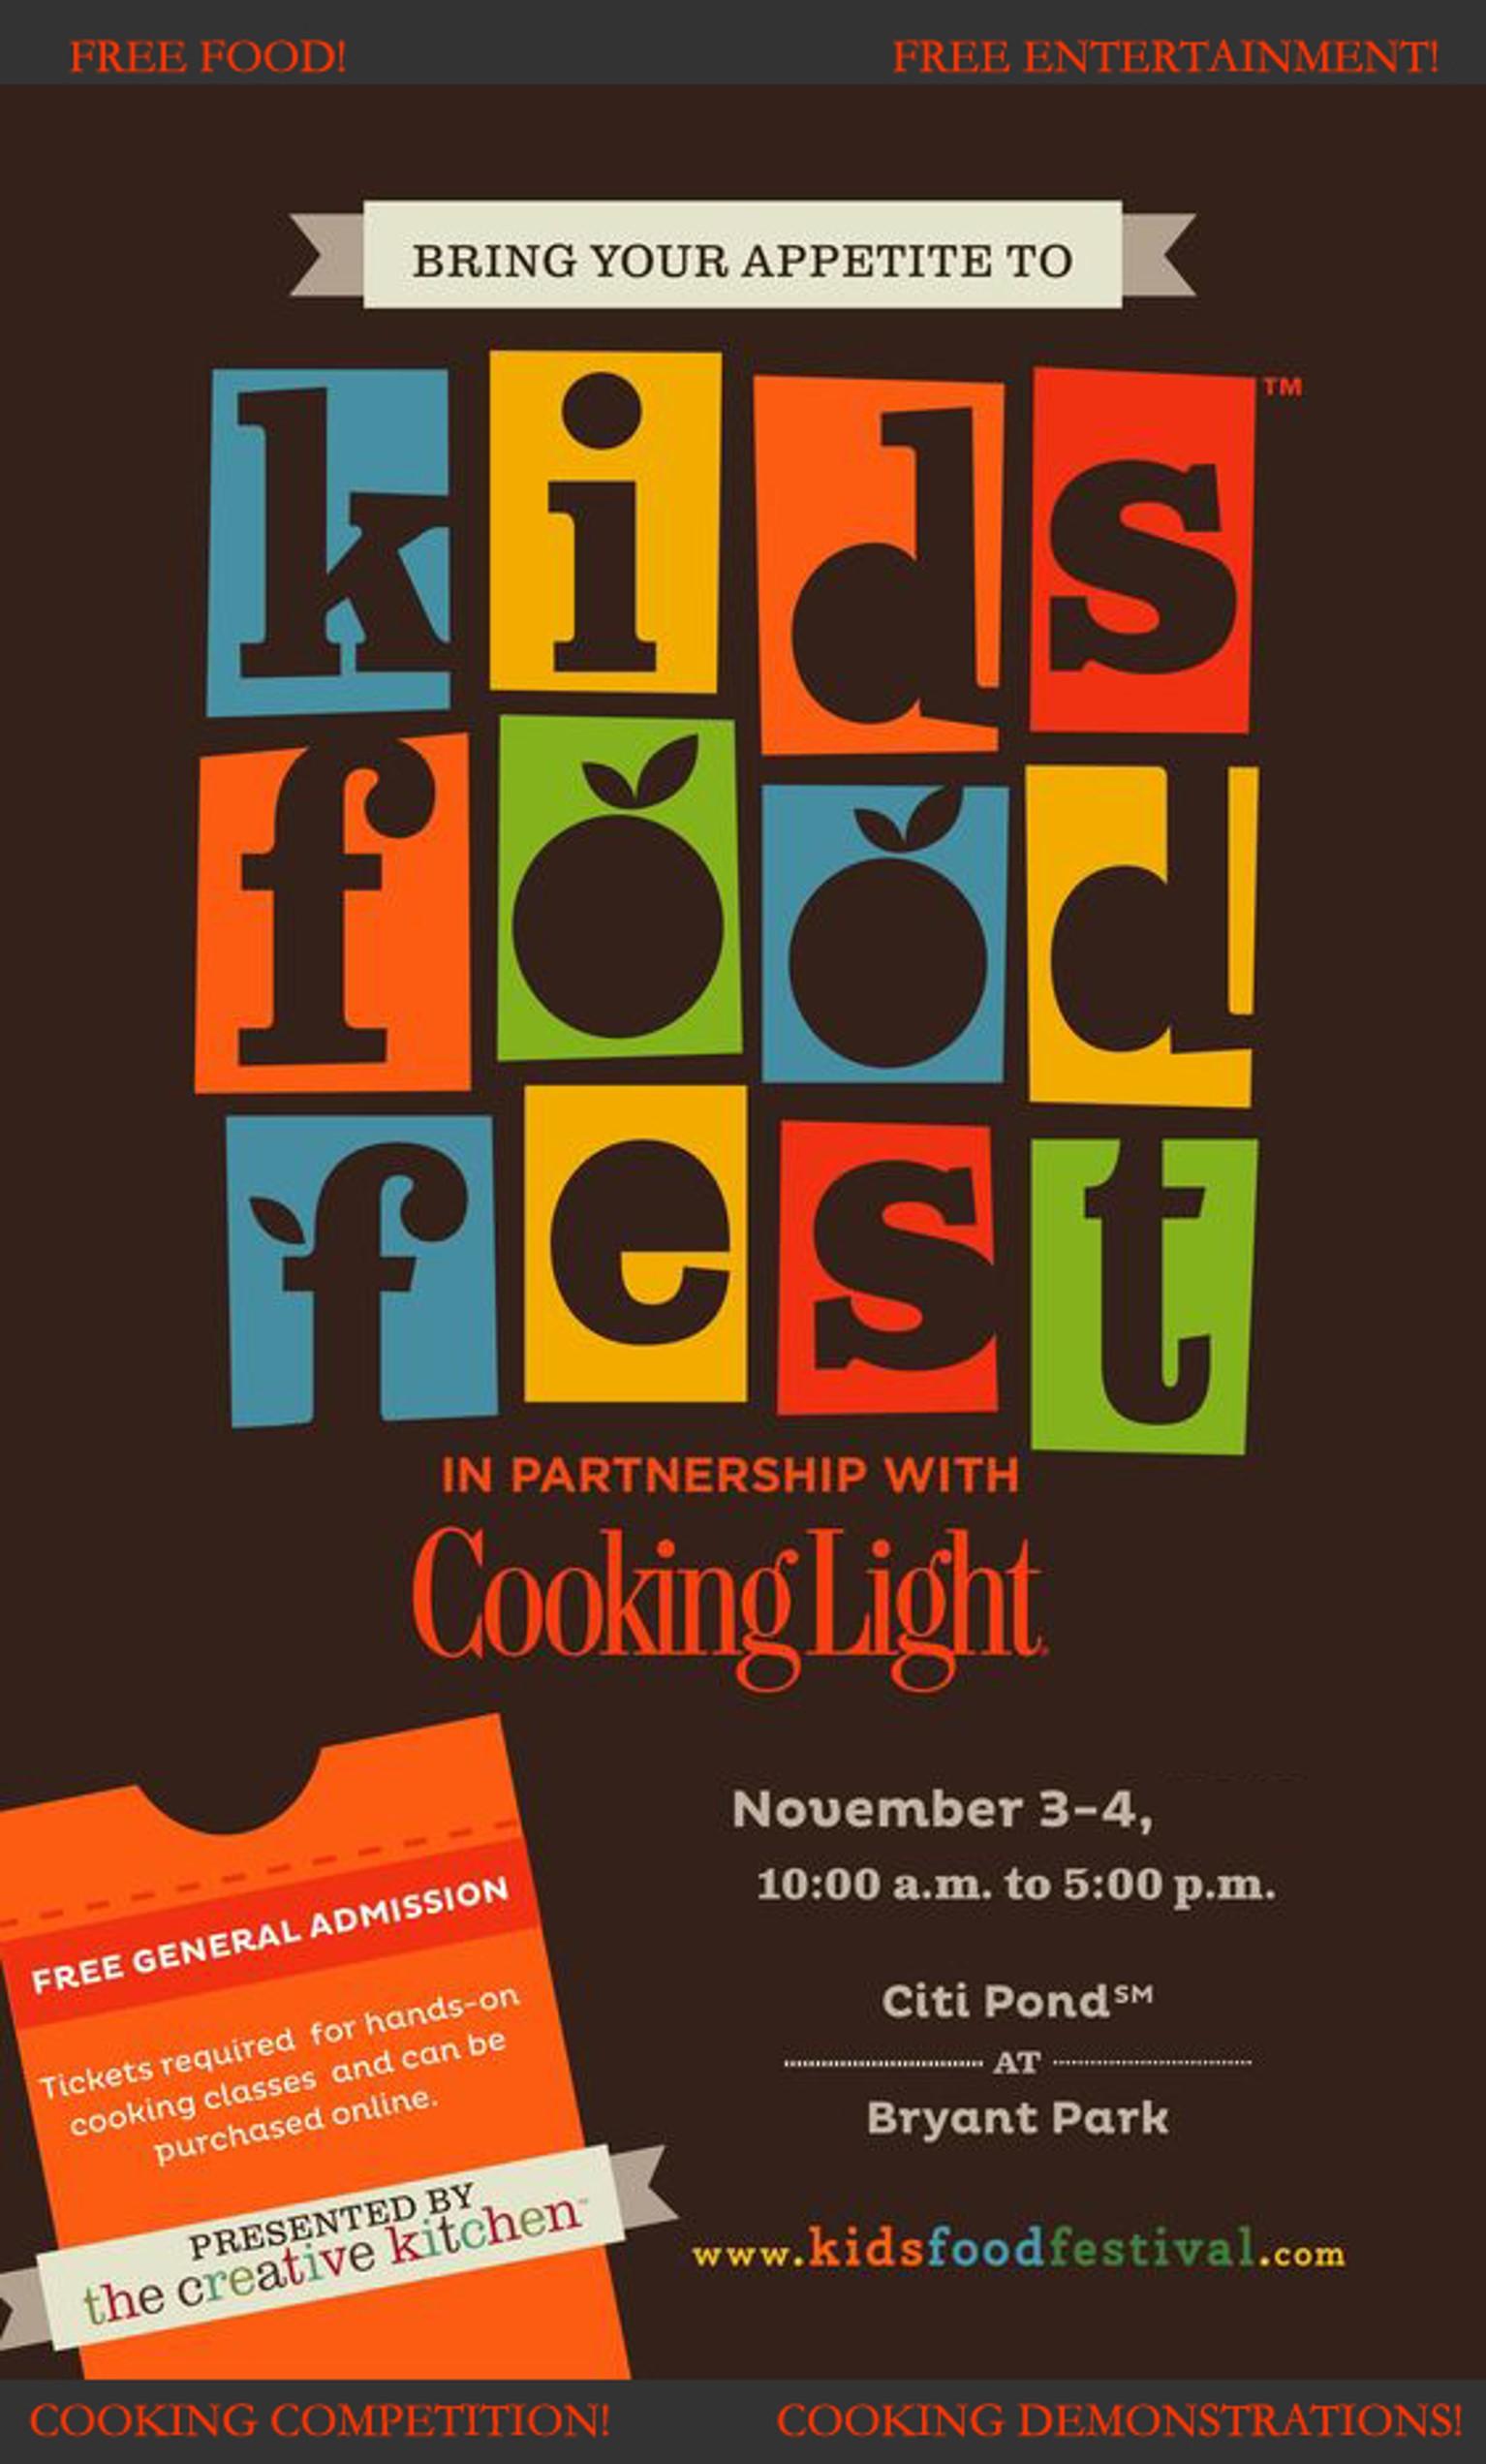 Unit F1: Kids' Food Fest -